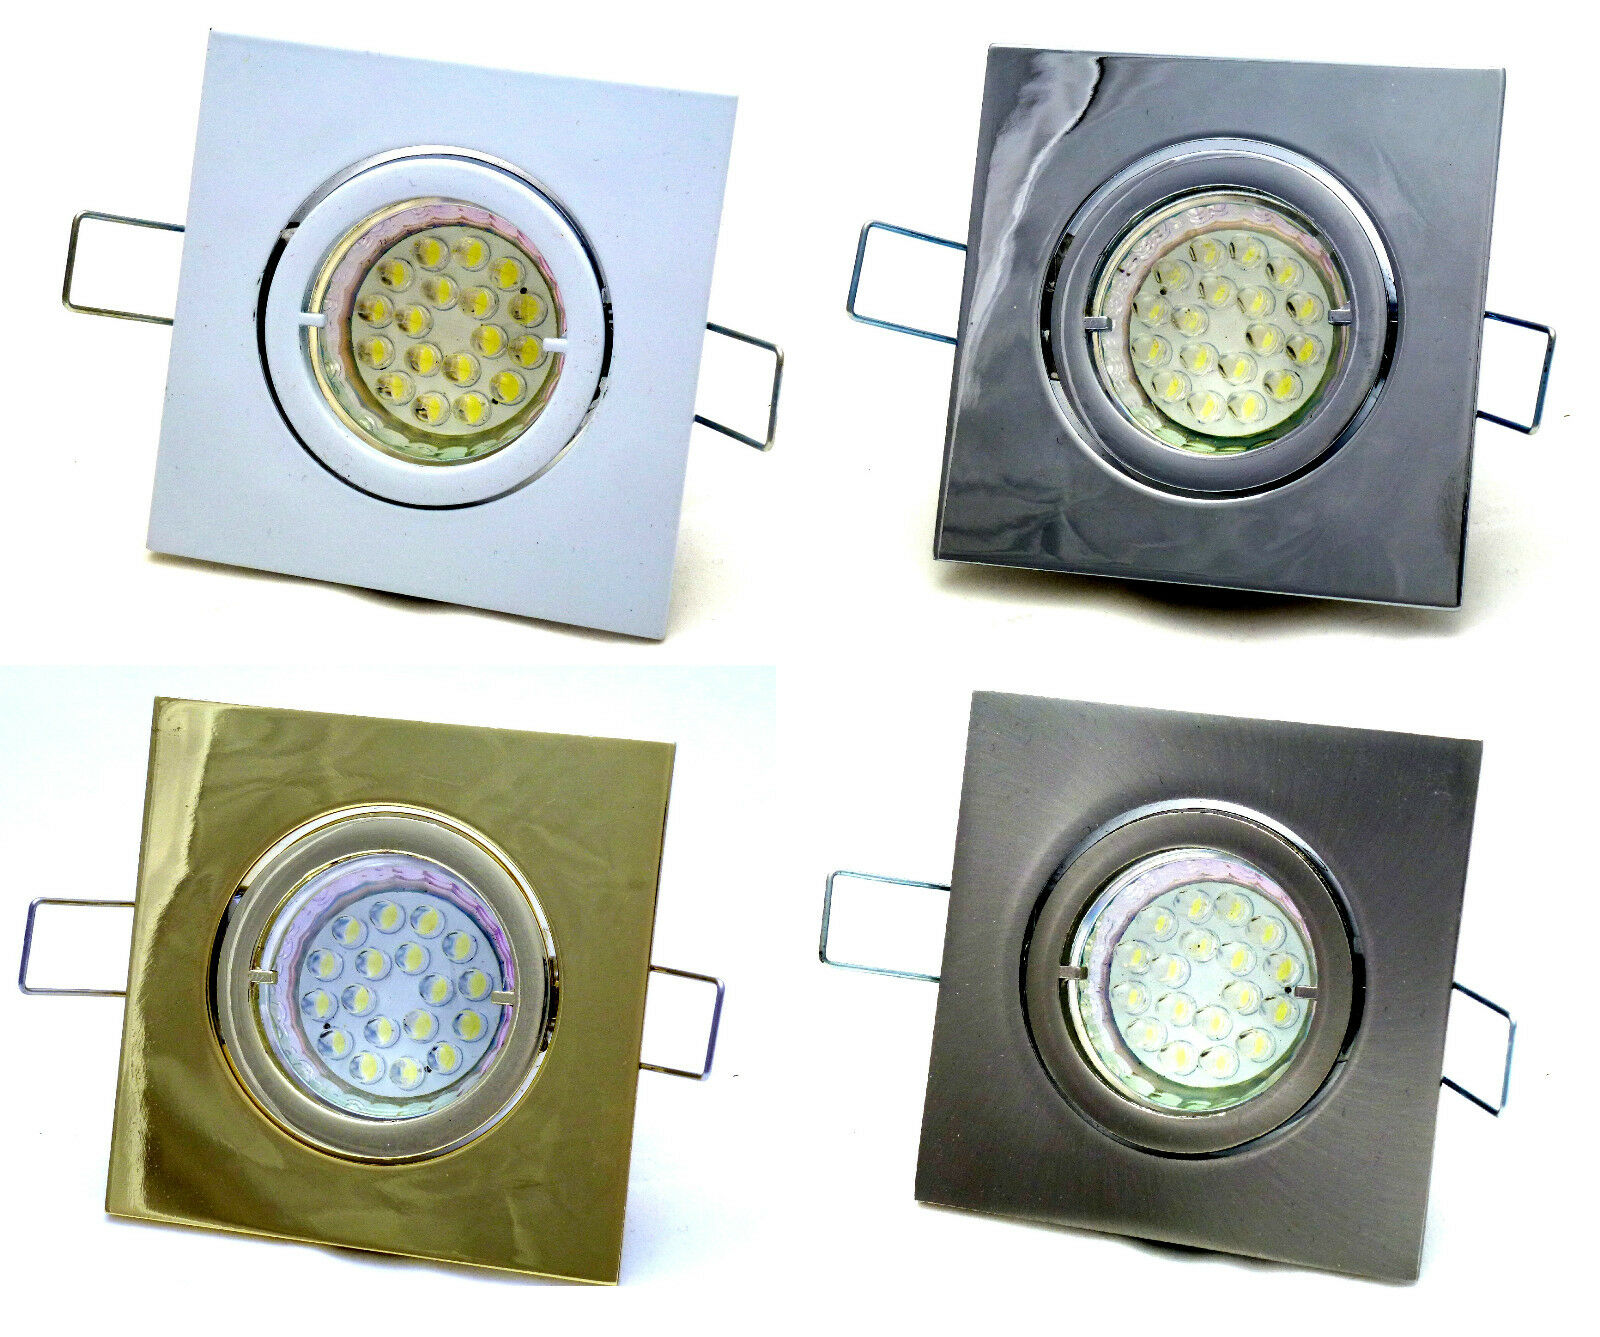 Strahlerlampe Louis 230V 20 LED 1,5WATT=20watt LAMPADA GU10